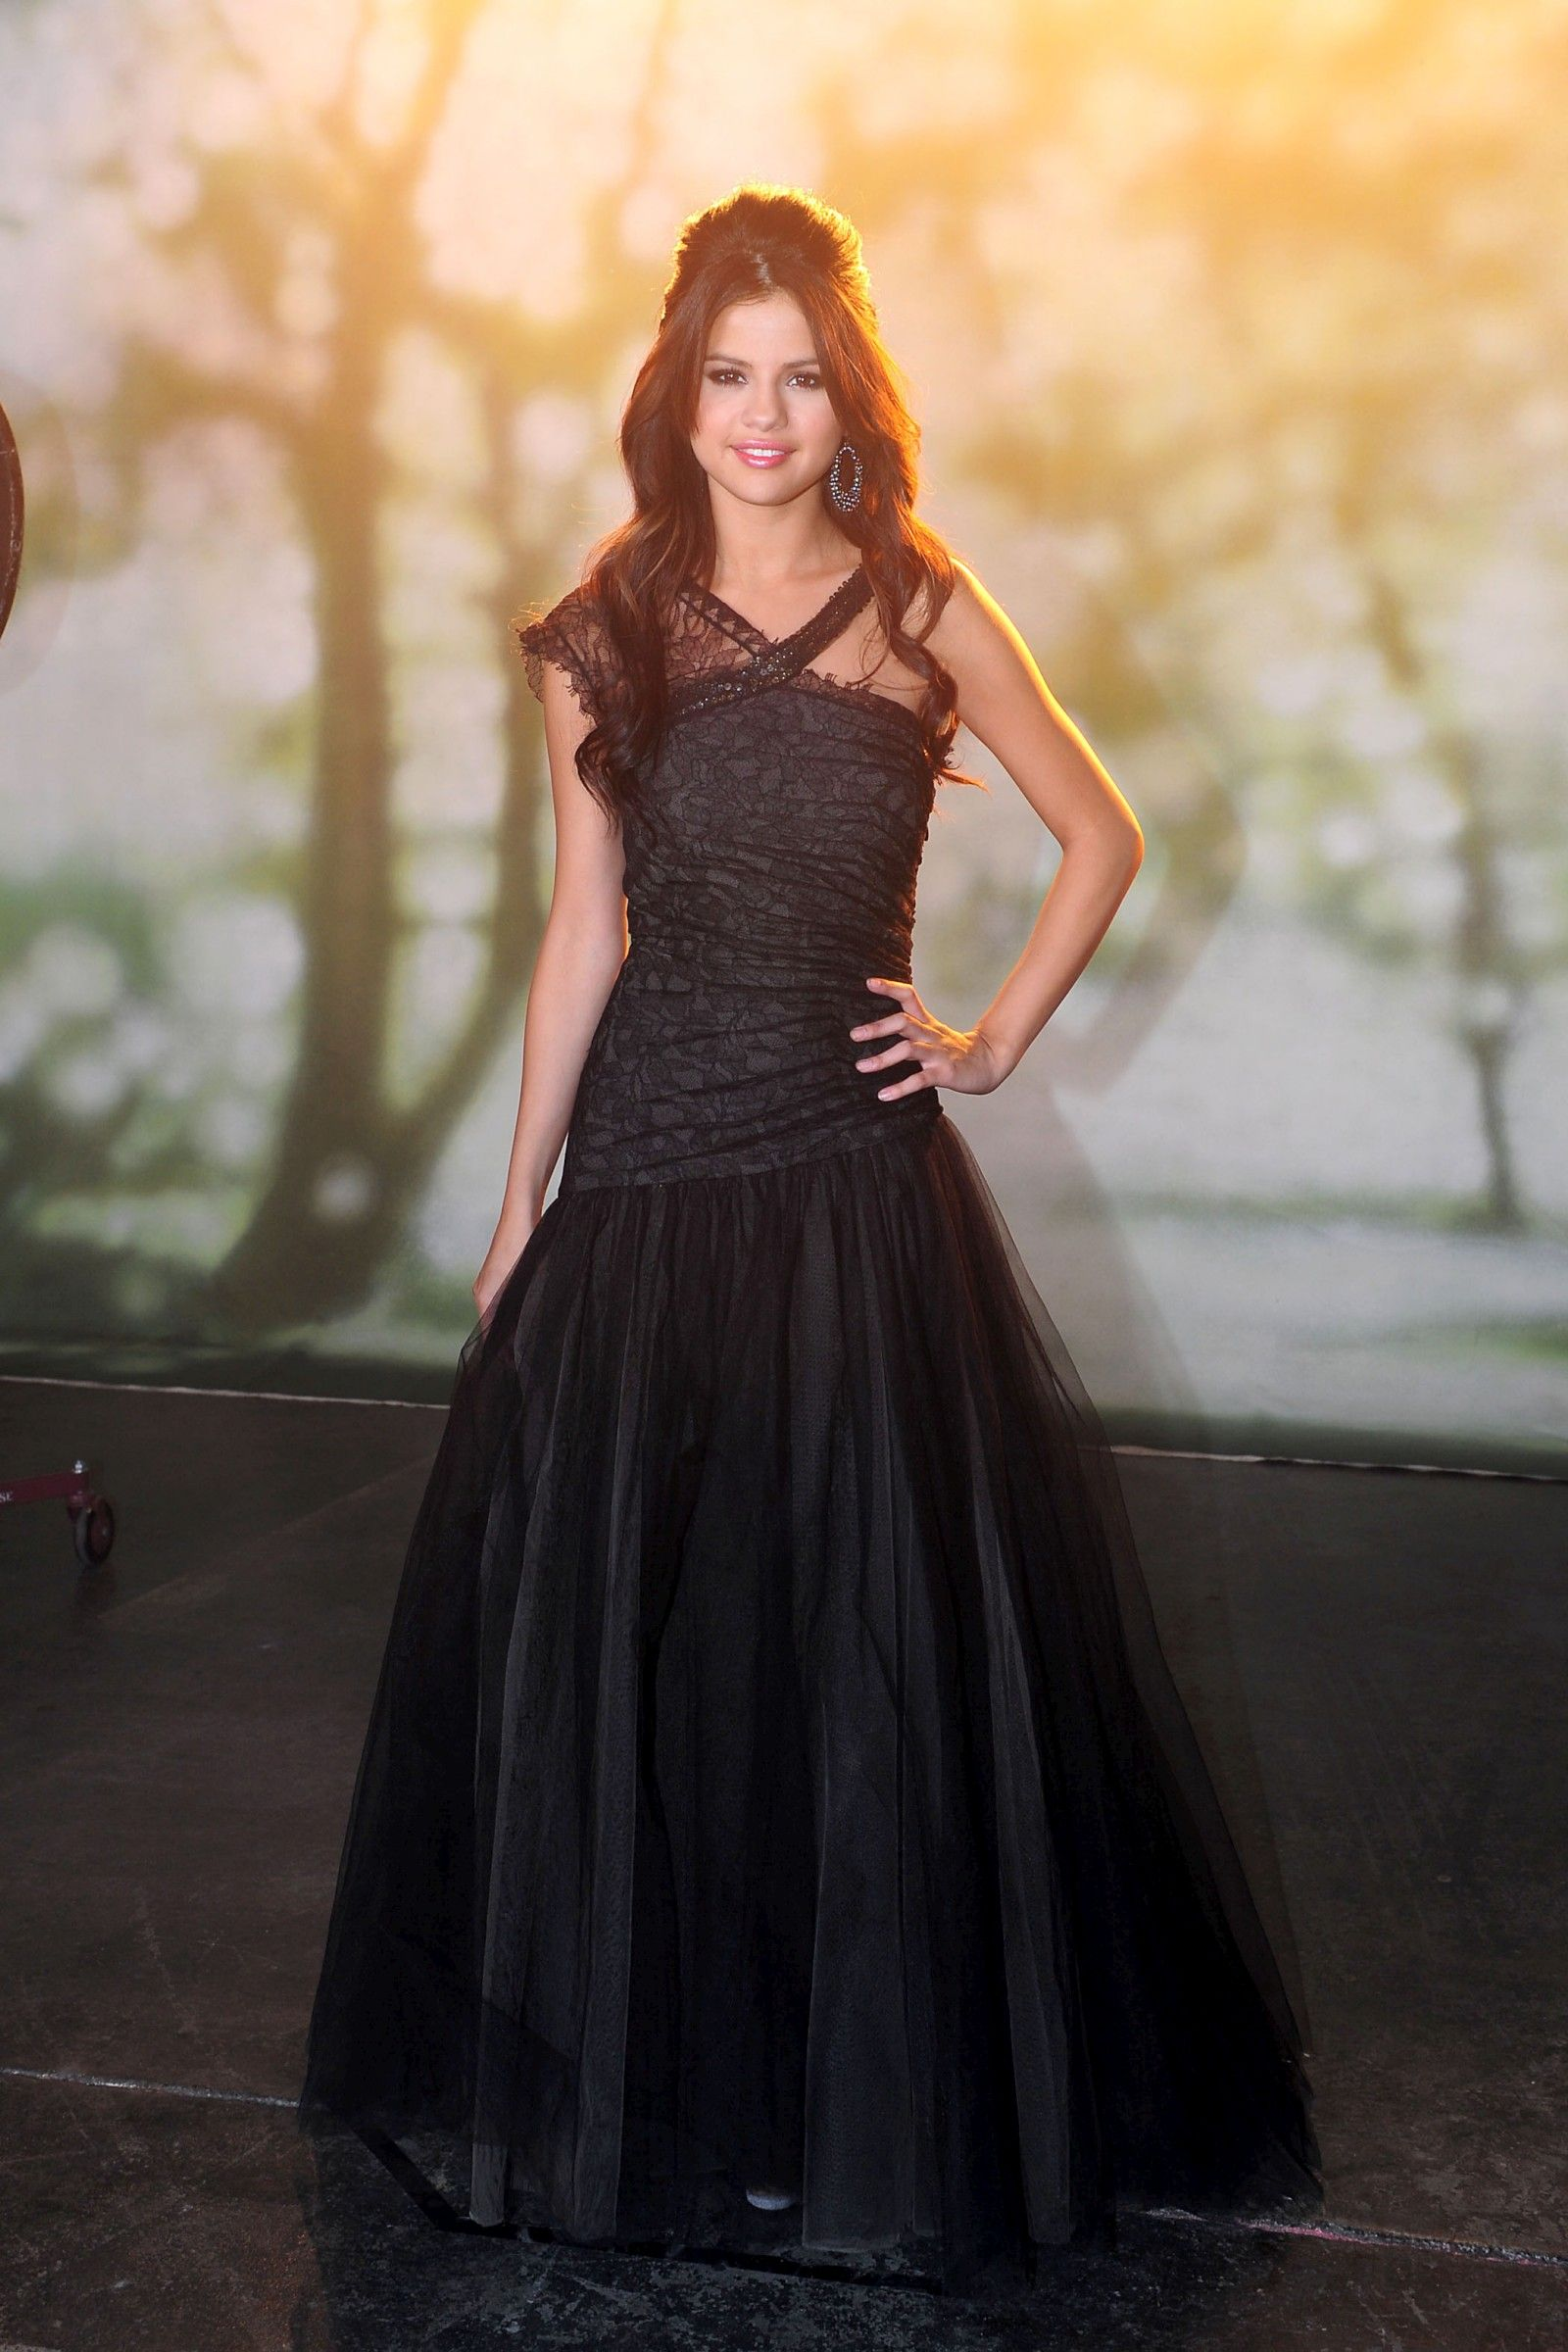 selena gomez long black dress celebrities amp public